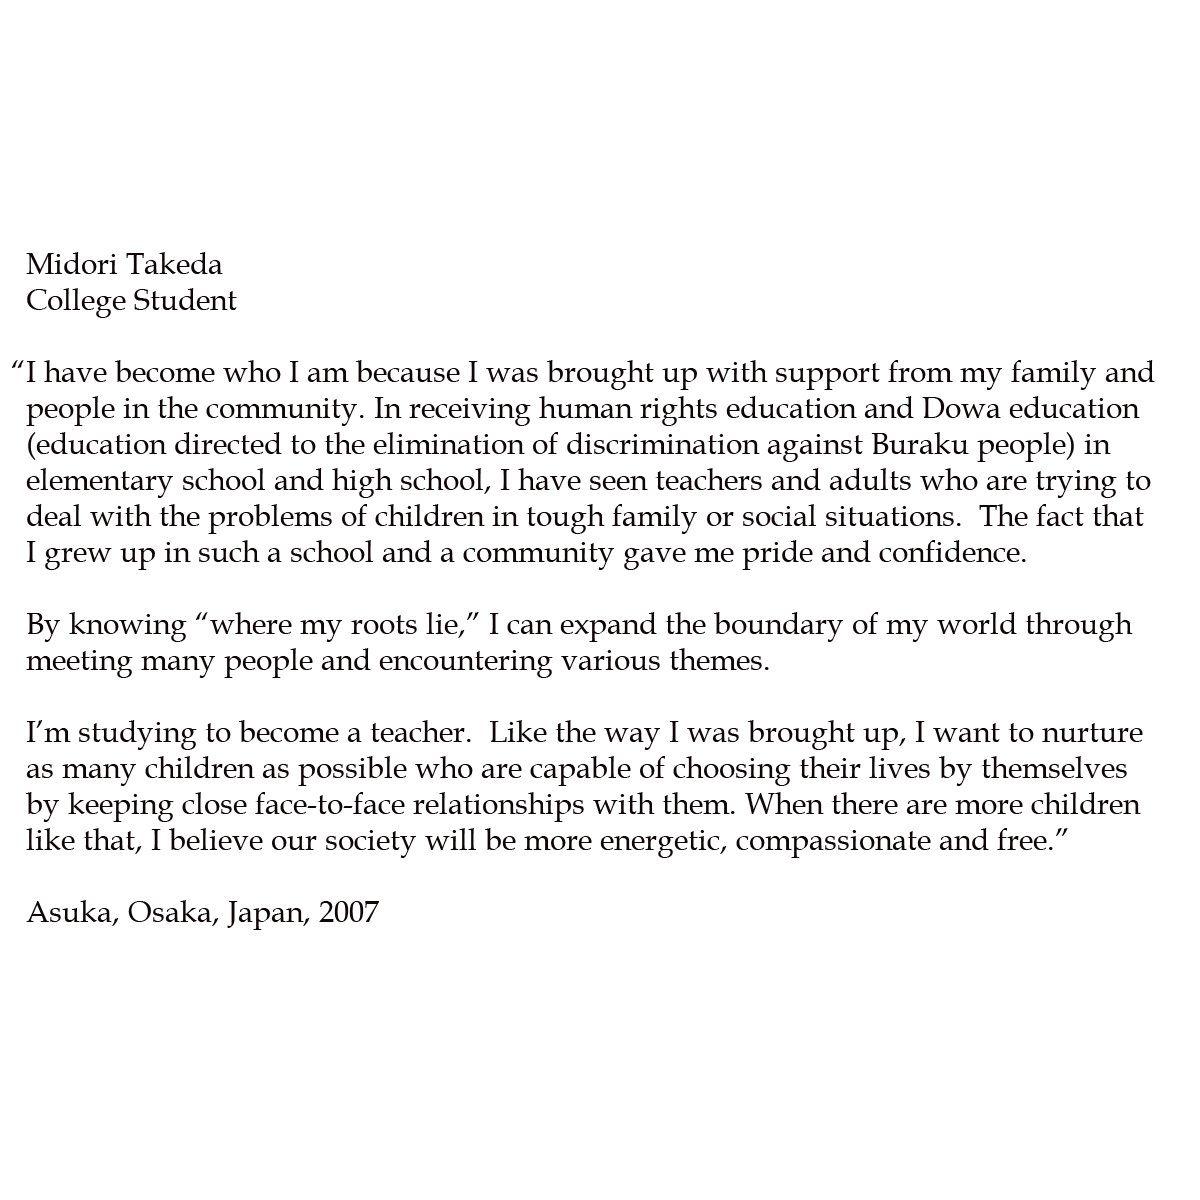 Midori Takeda. College Student.